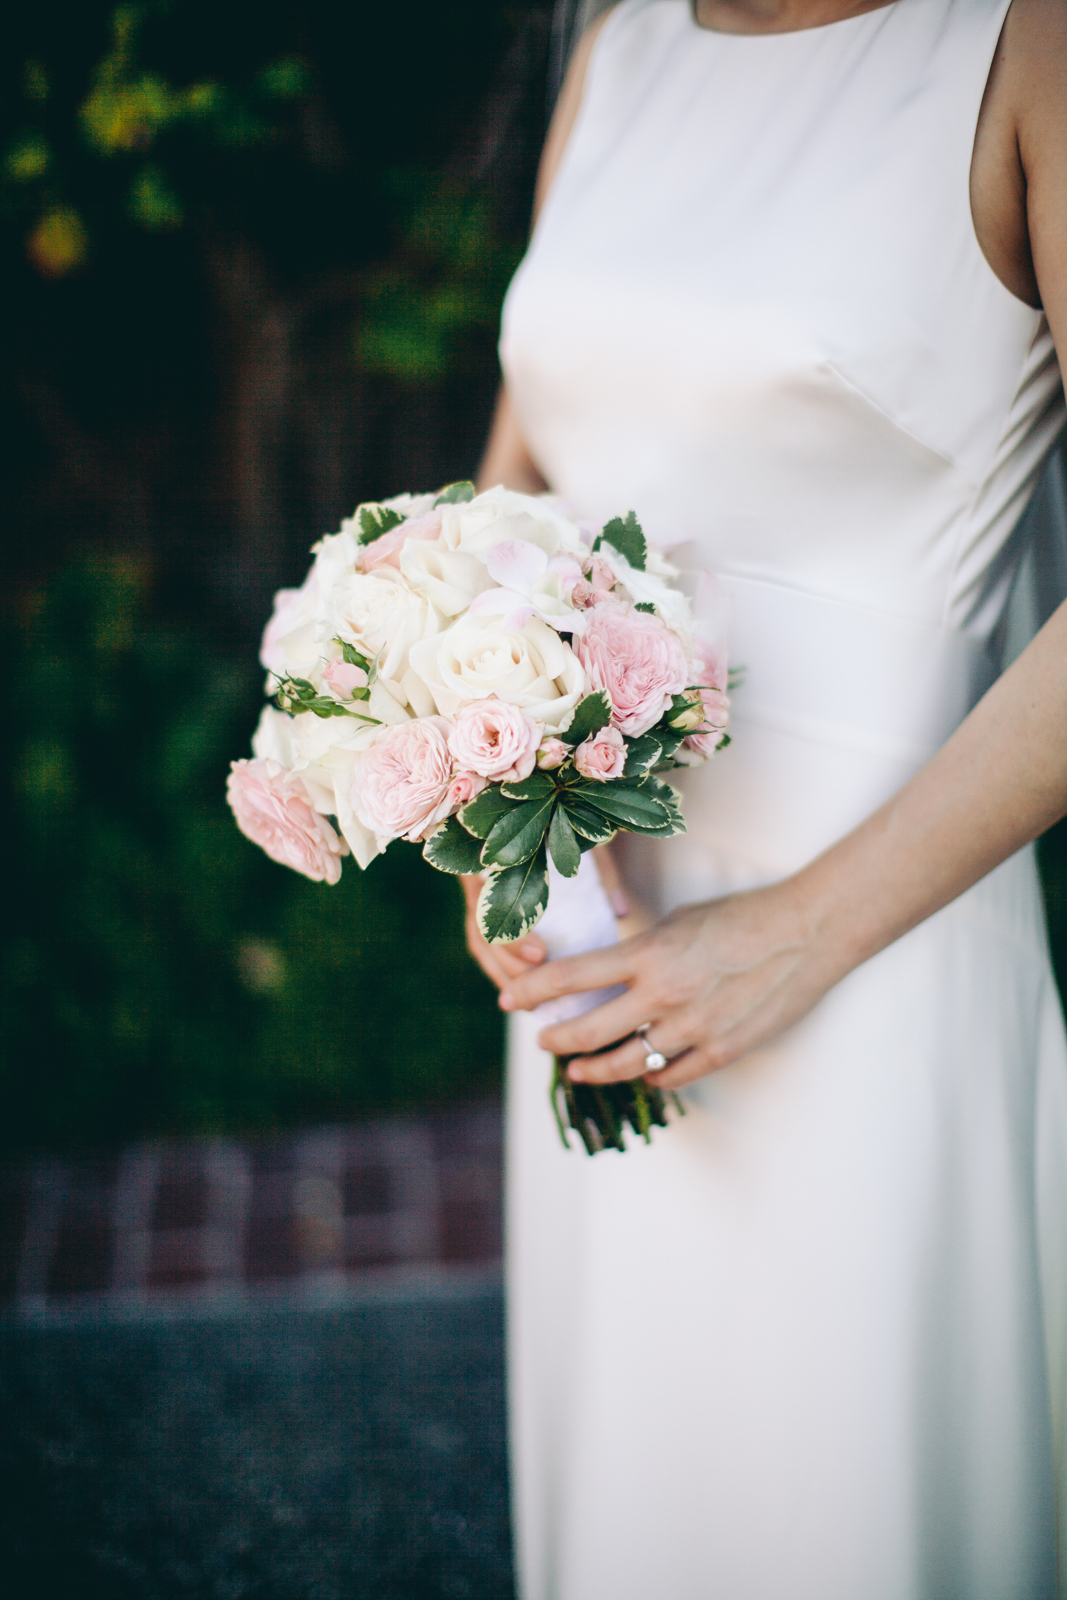 kohl_manison_wedding_photography_sarah_eric_ebony_siovhan_bokeh_photography_037.jpg